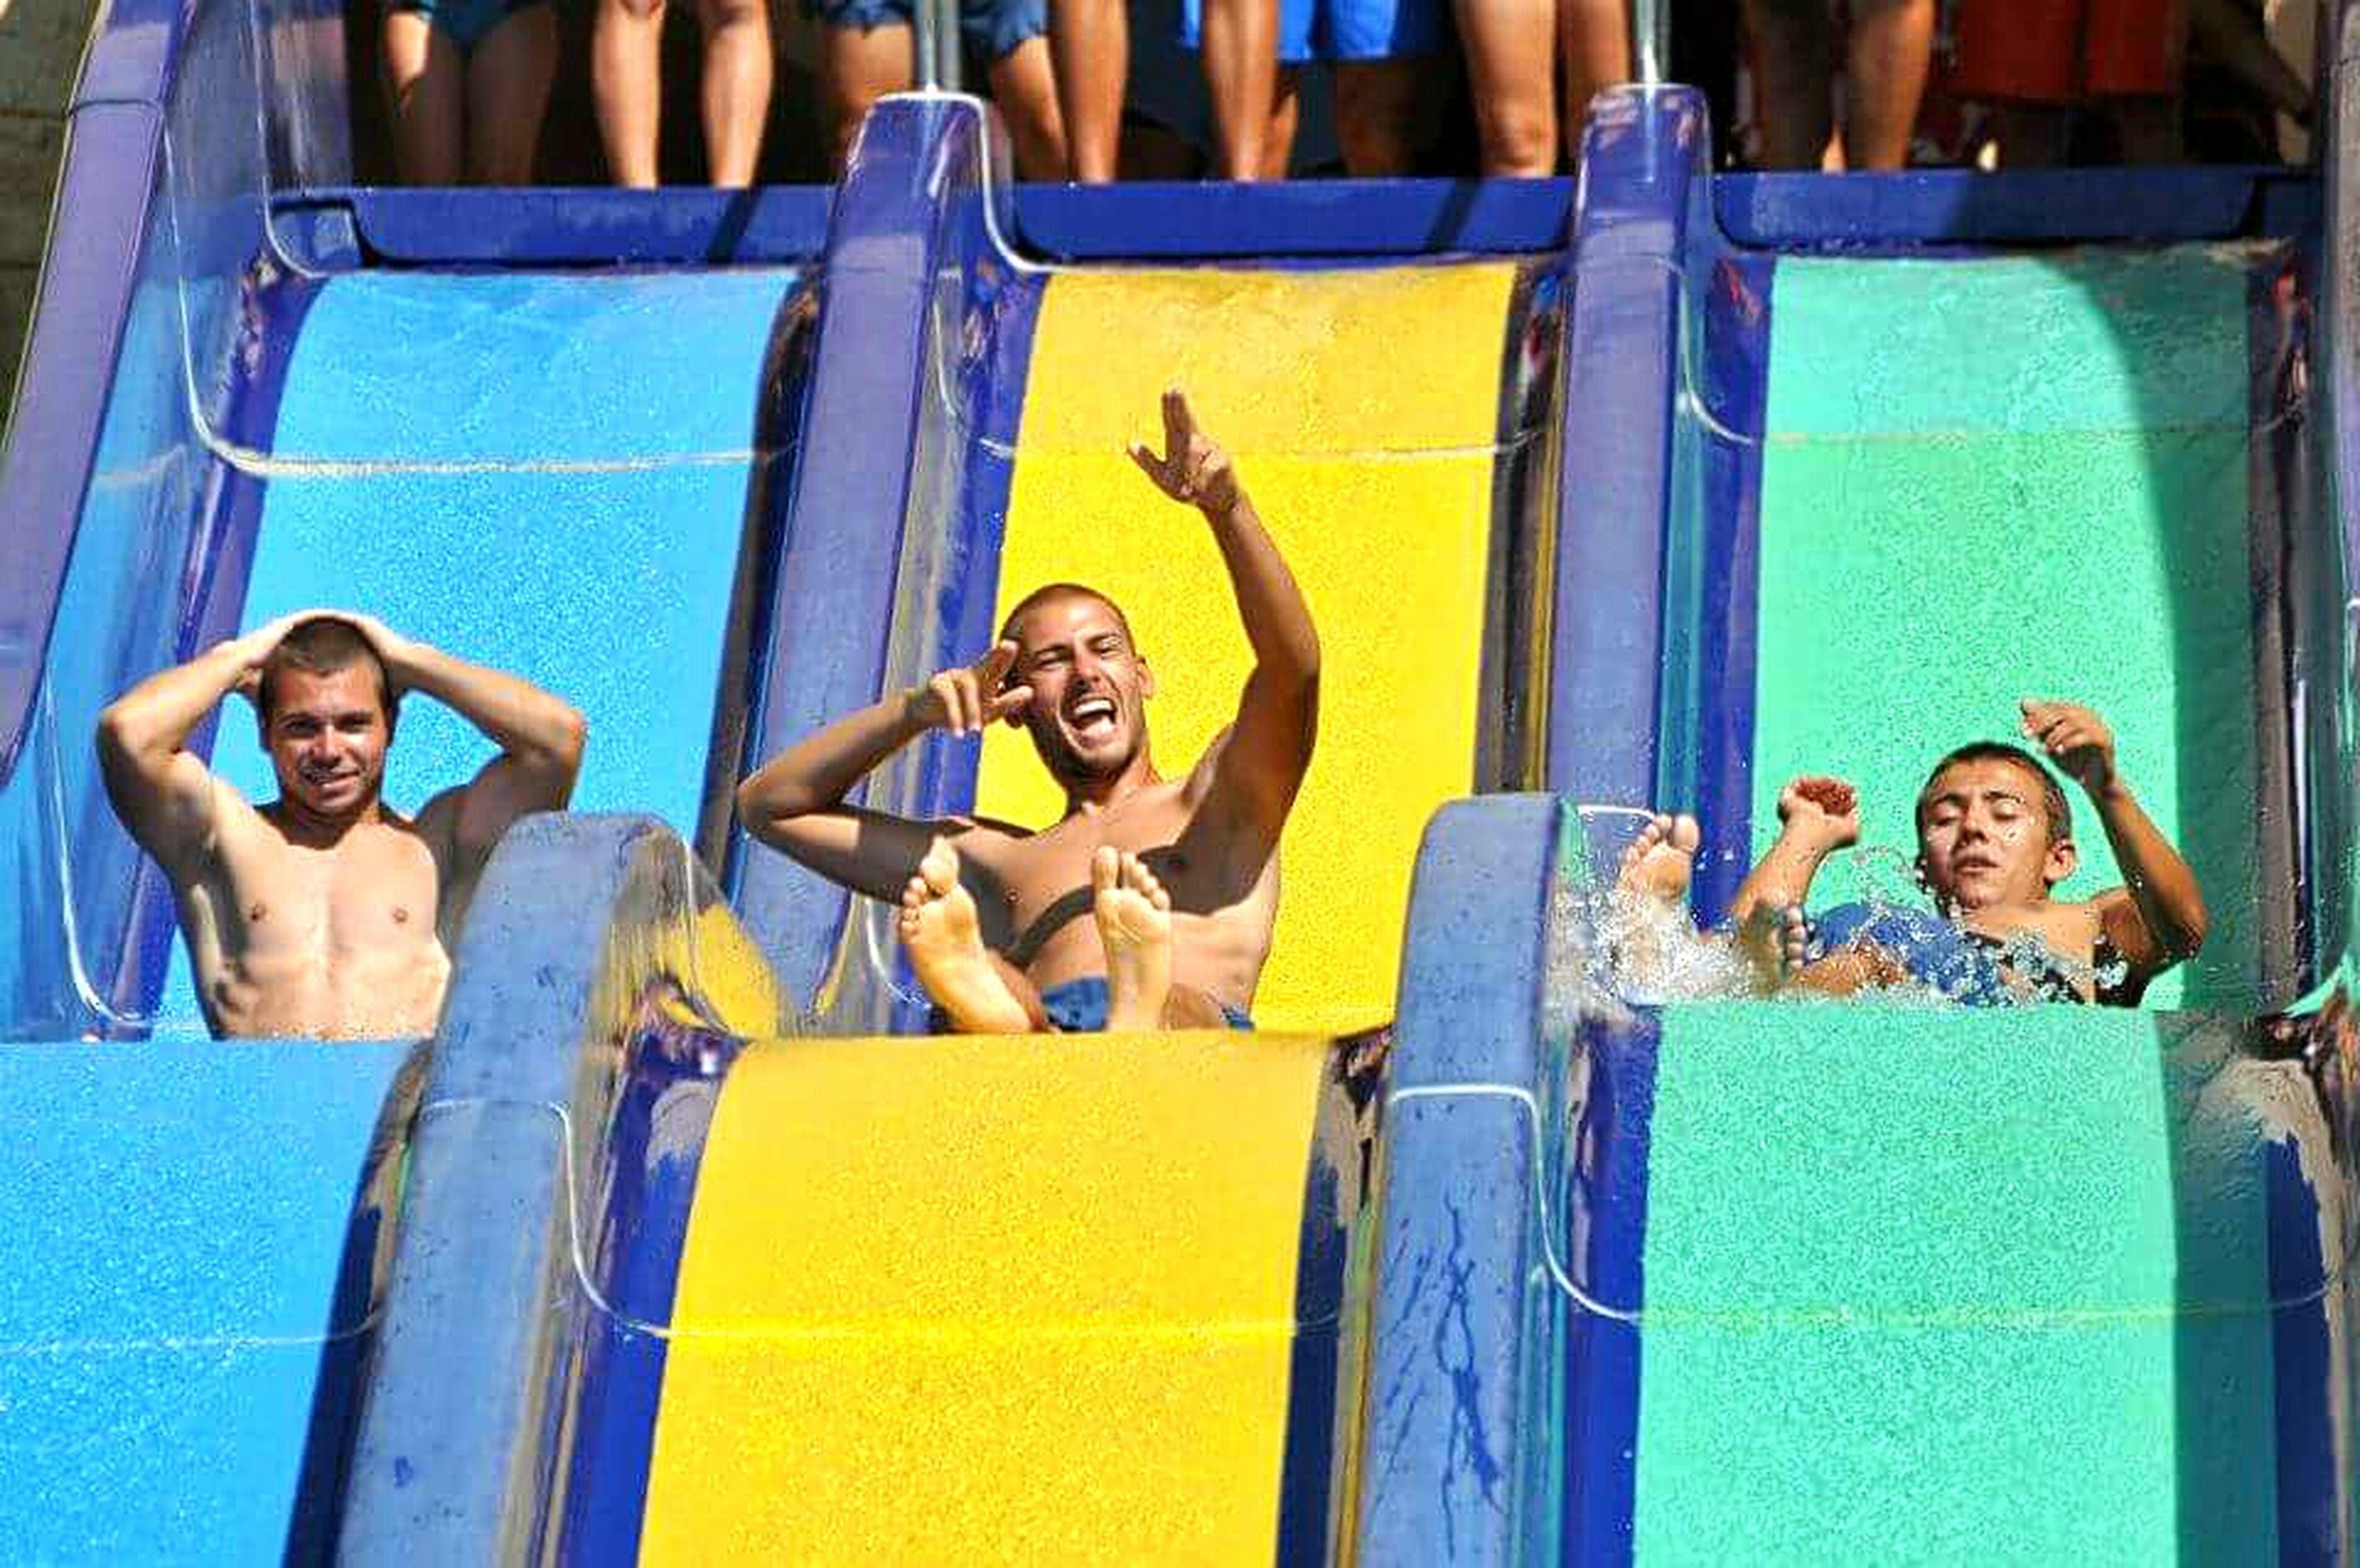 Fun Summer2016 Slalom Slide Water Colors Sunyday🌞 BoysBoysBoys Bulgaria <3 Nessebar Nikon